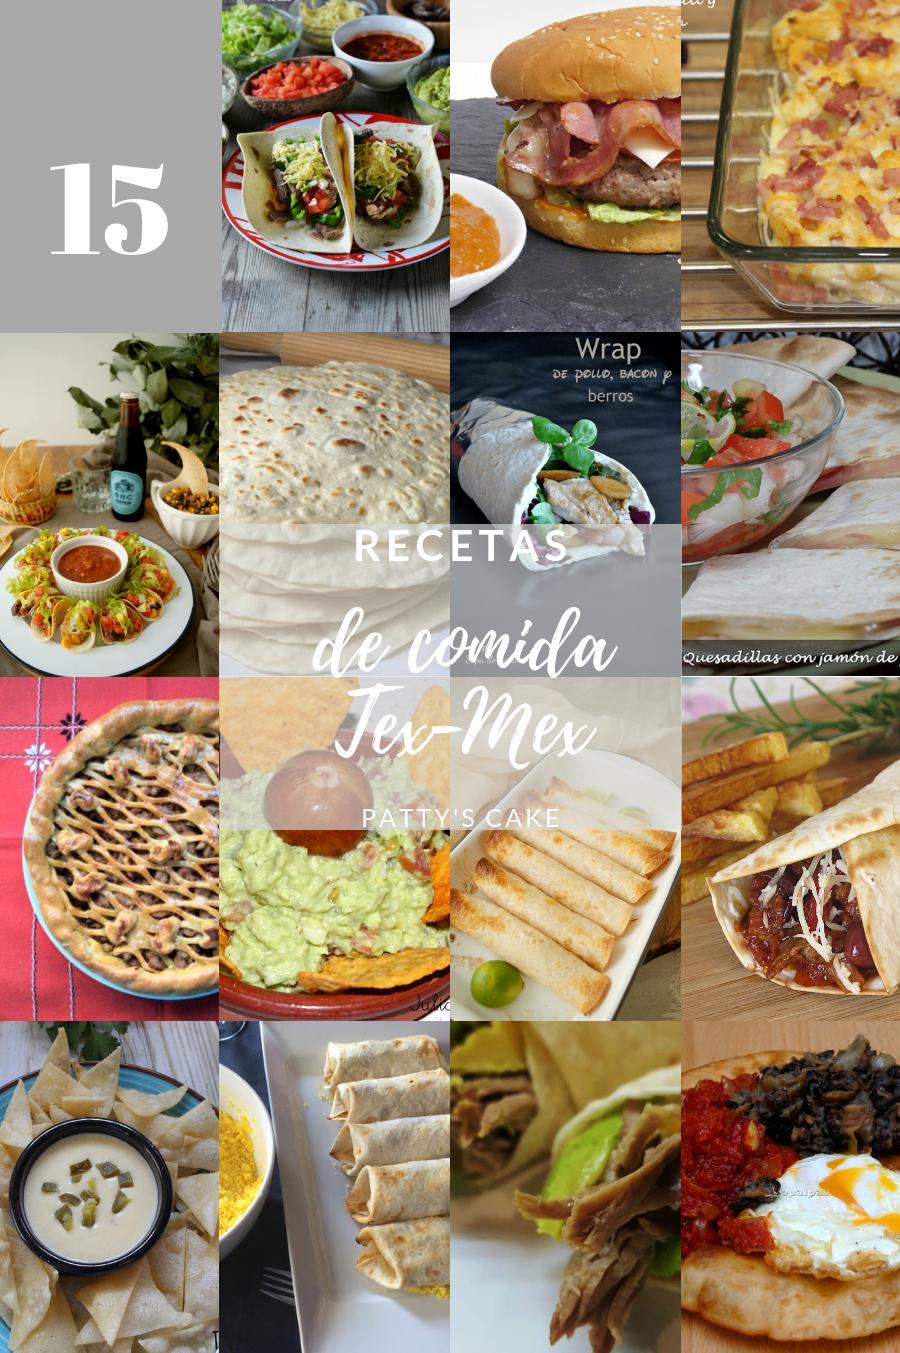 15 recetas de comida tex-mex